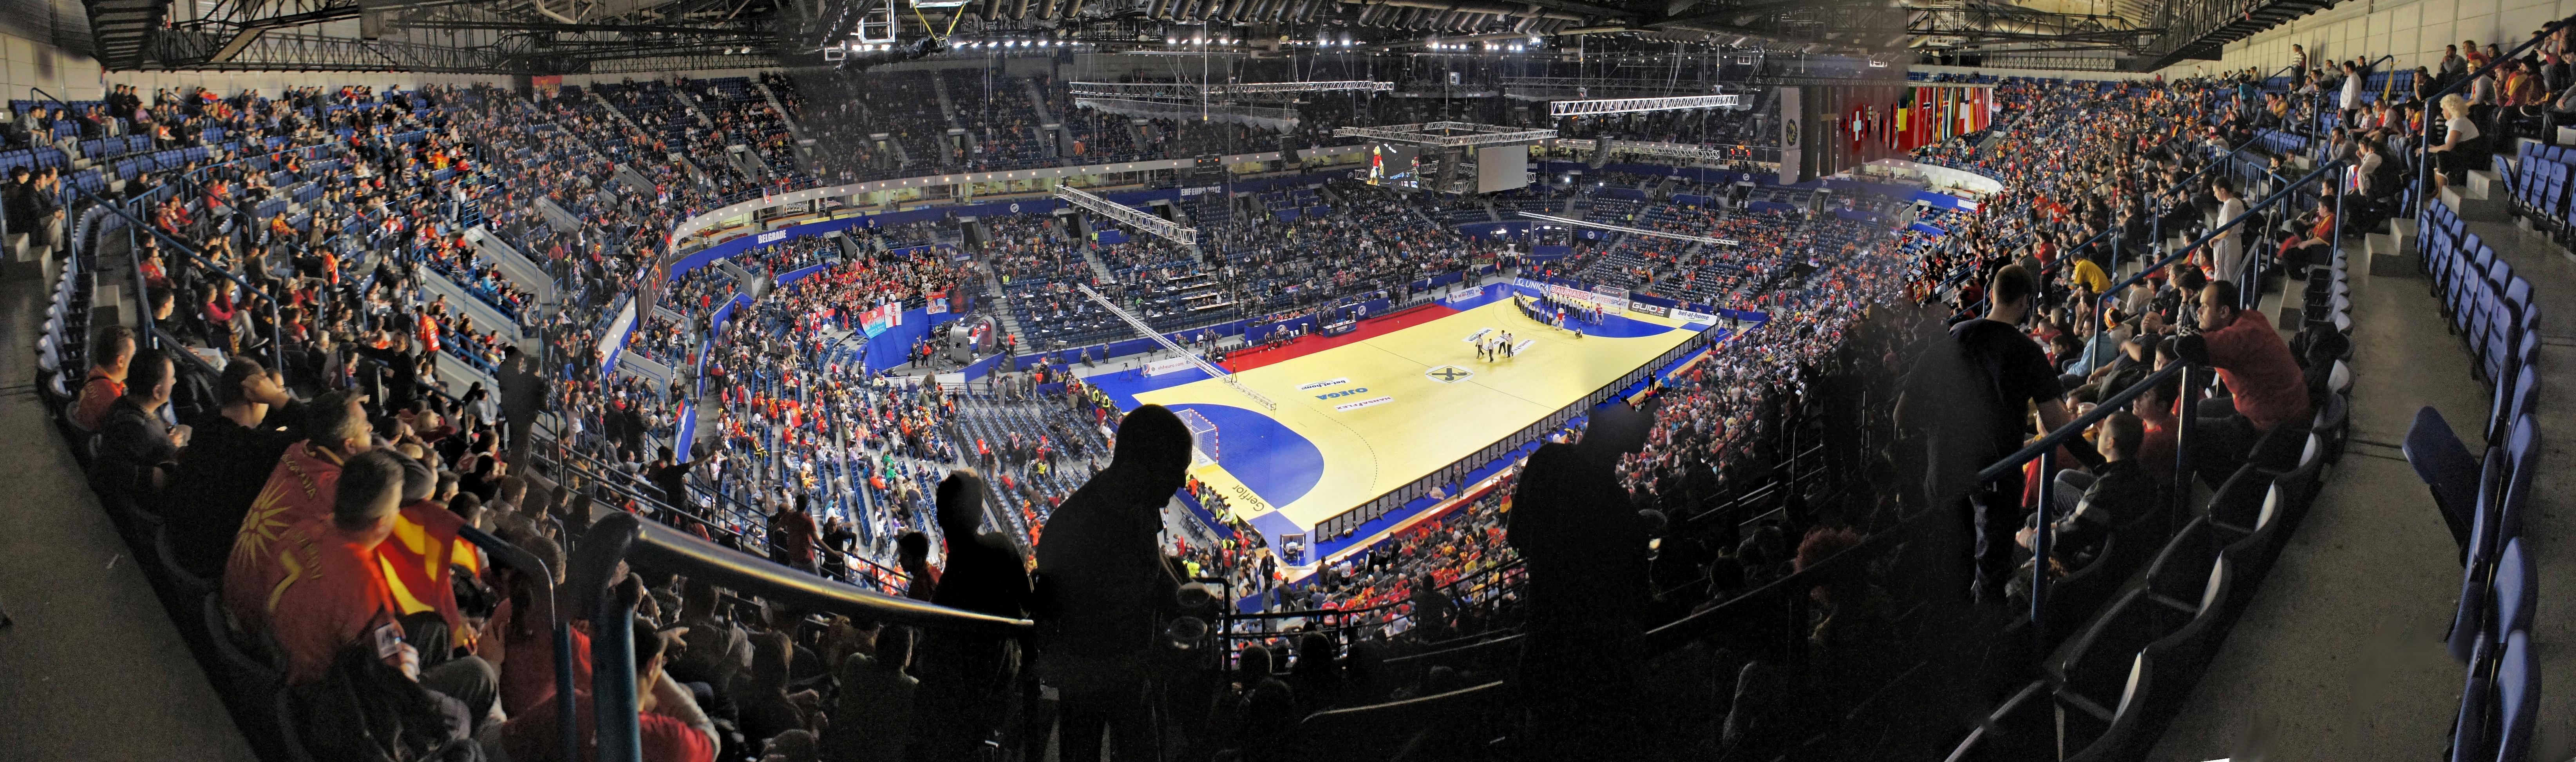 Arena_Beograd